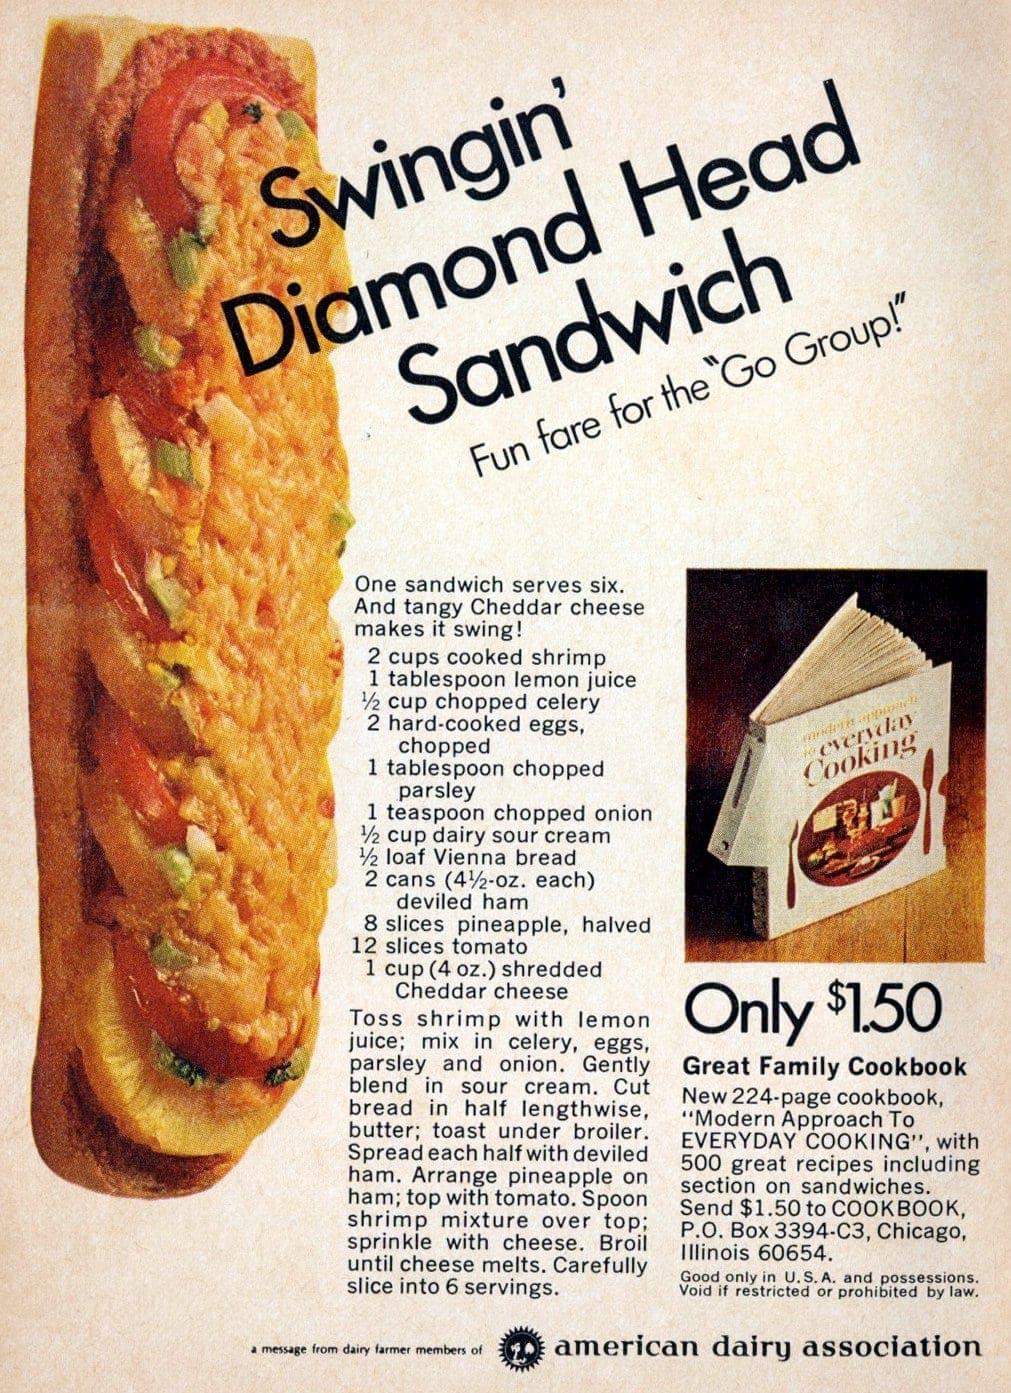 Swingin Diamond Head sandwich recipe - Luau party from the 1960s